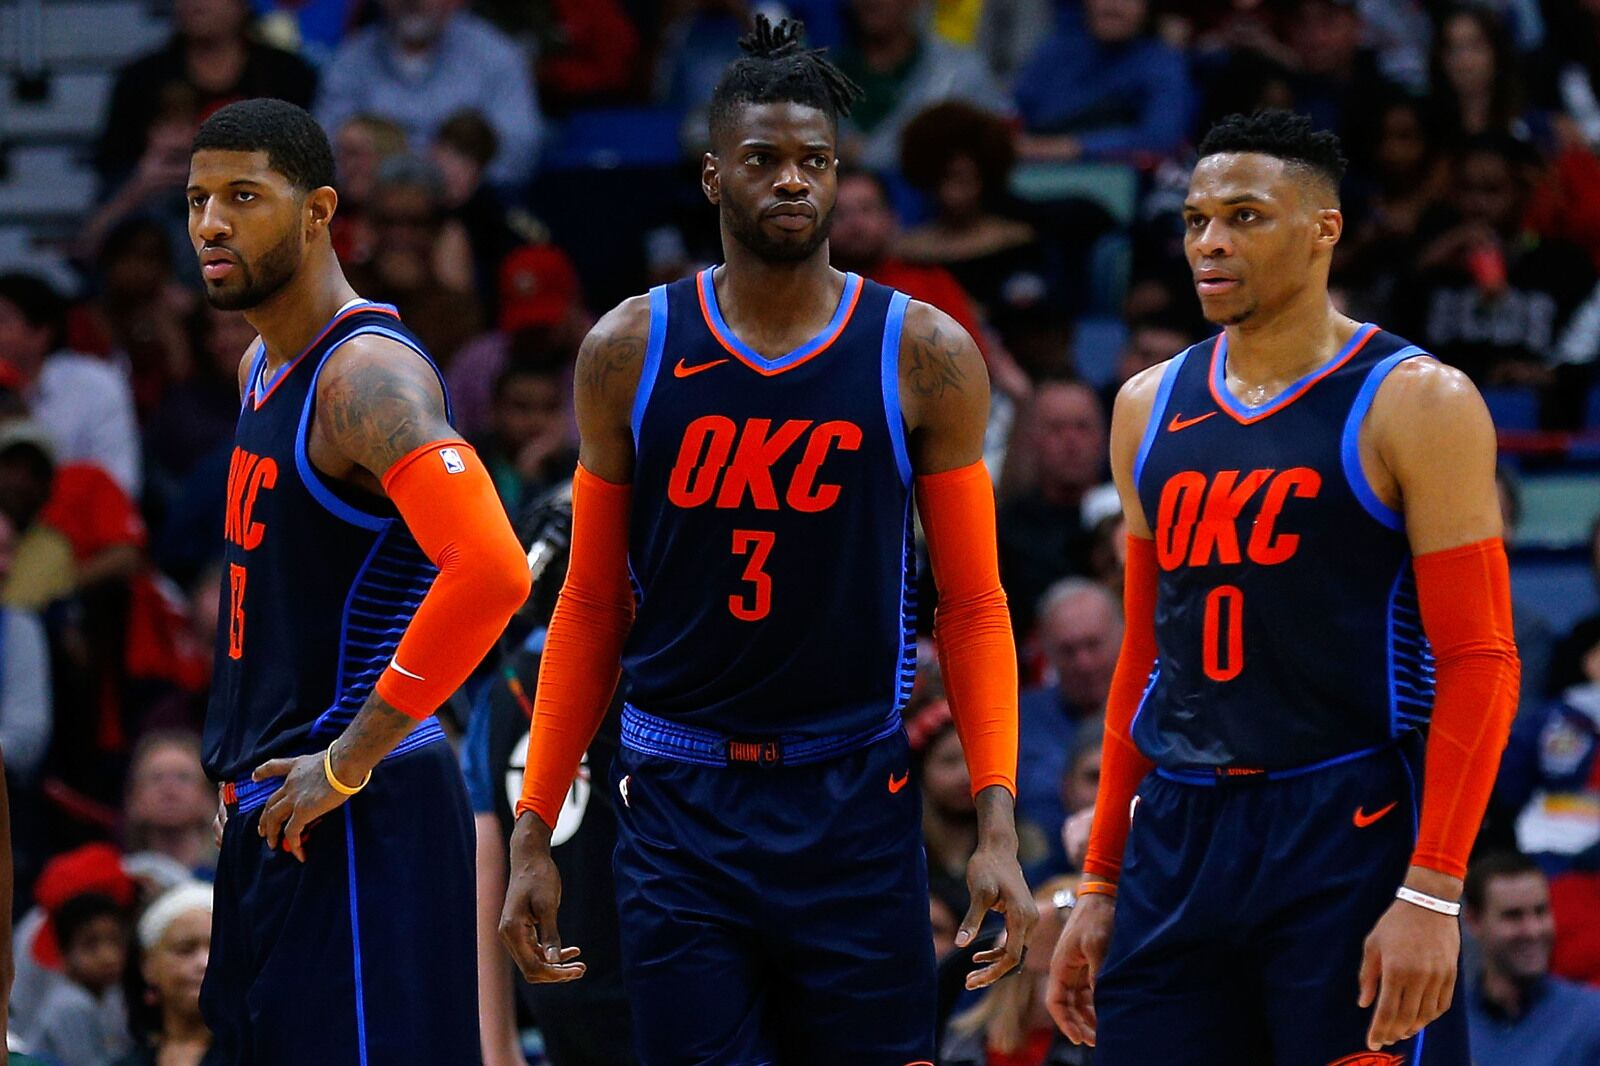 Oklahoma City Thunder: 3 big questions following 2019 NBA